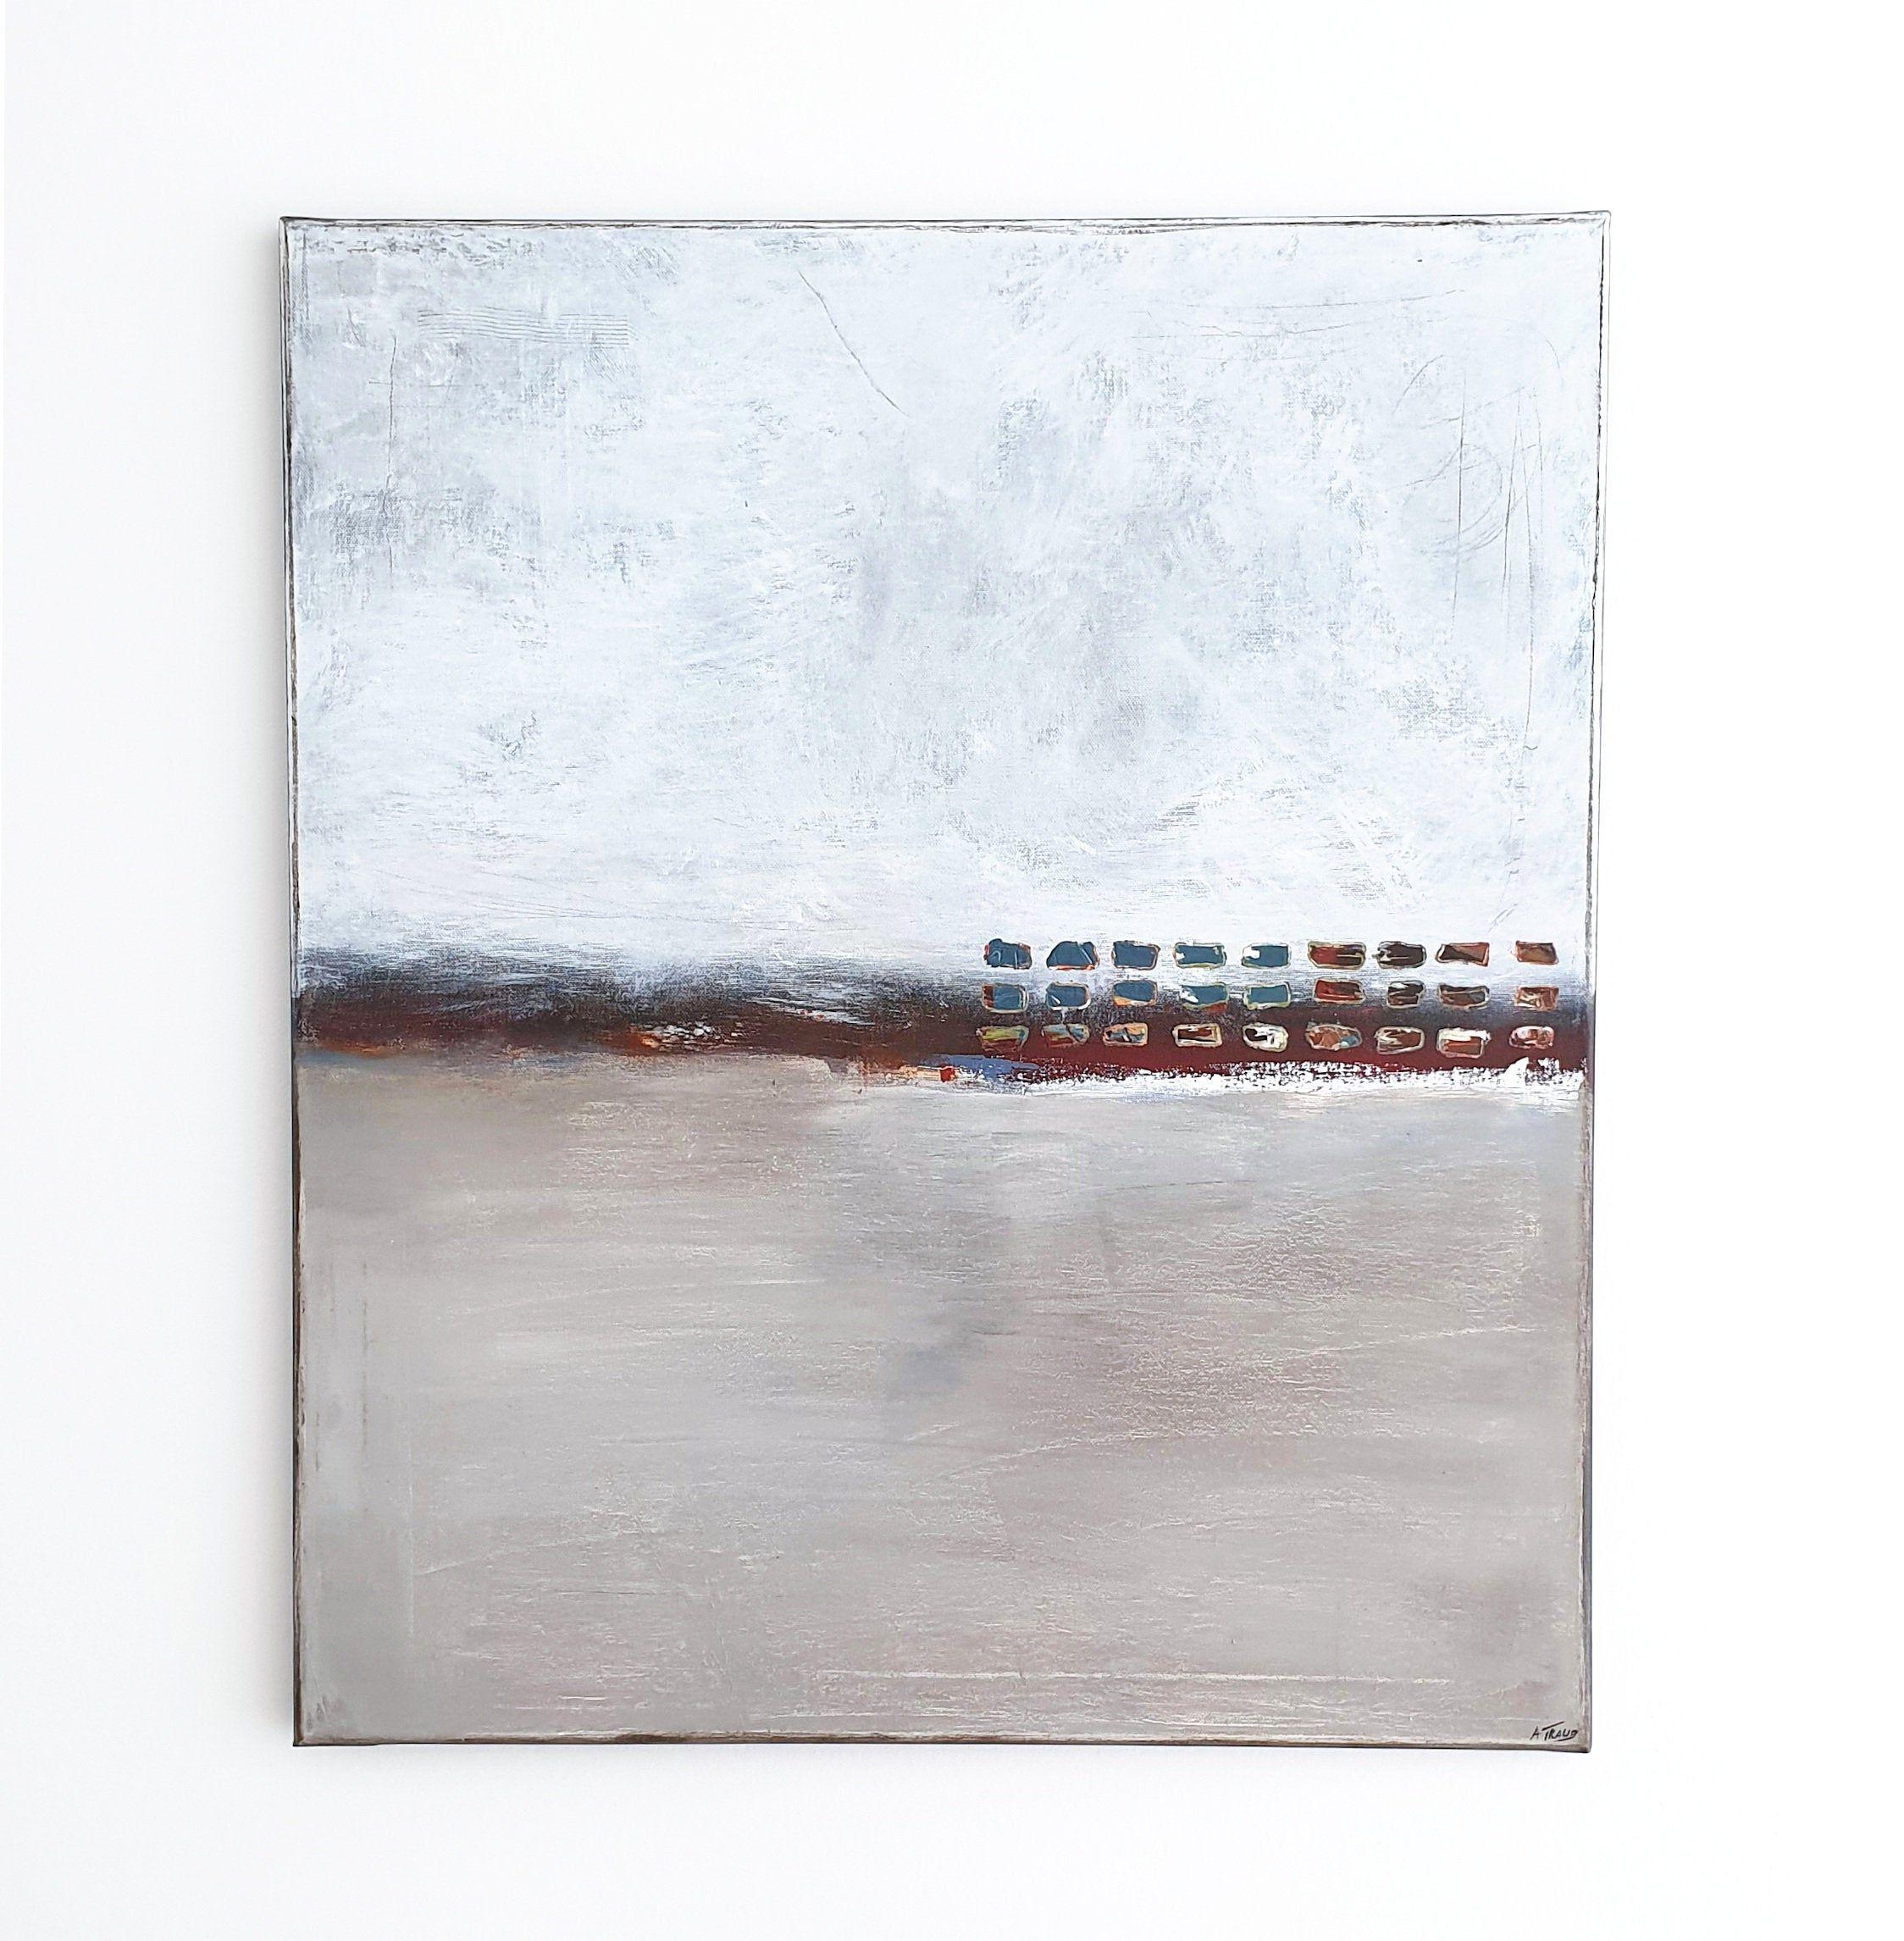 a traub malerei 60x70 cm acryl auf leinwand kunst modern etsy abstract artwork naturbilder 90x70